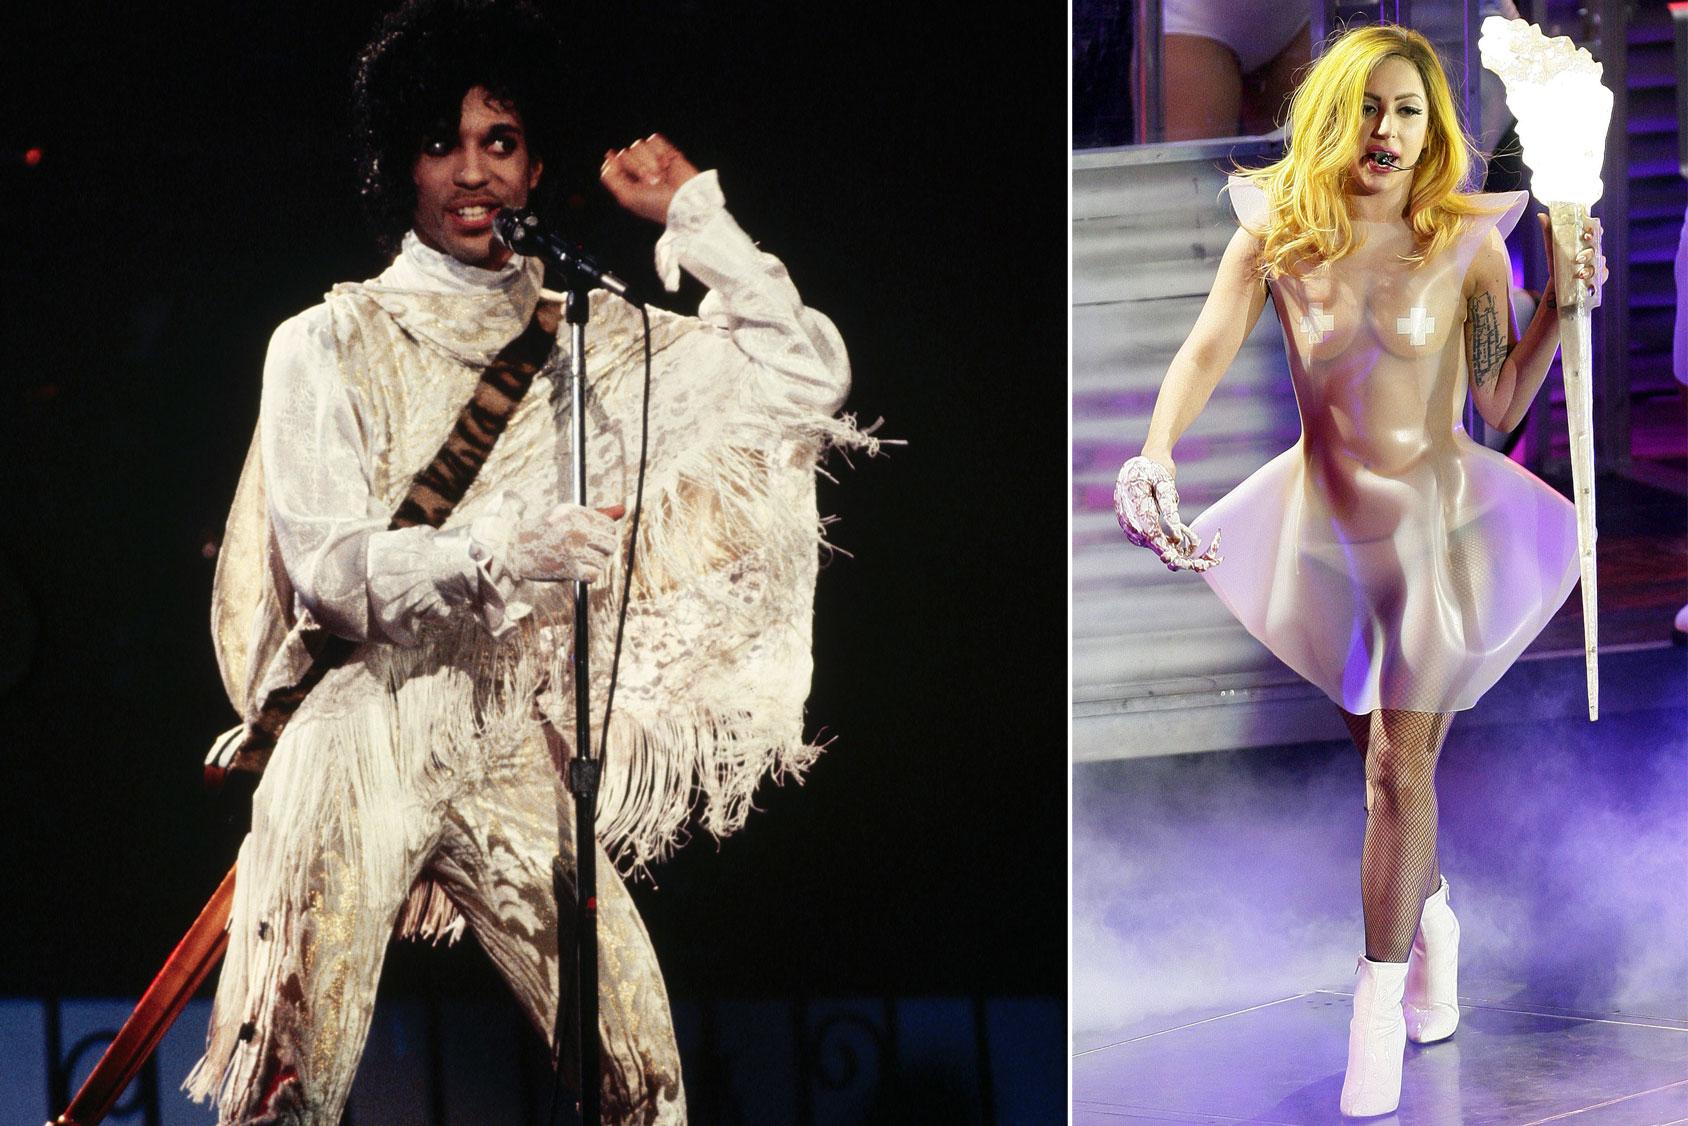 Prince & Lady Gaga